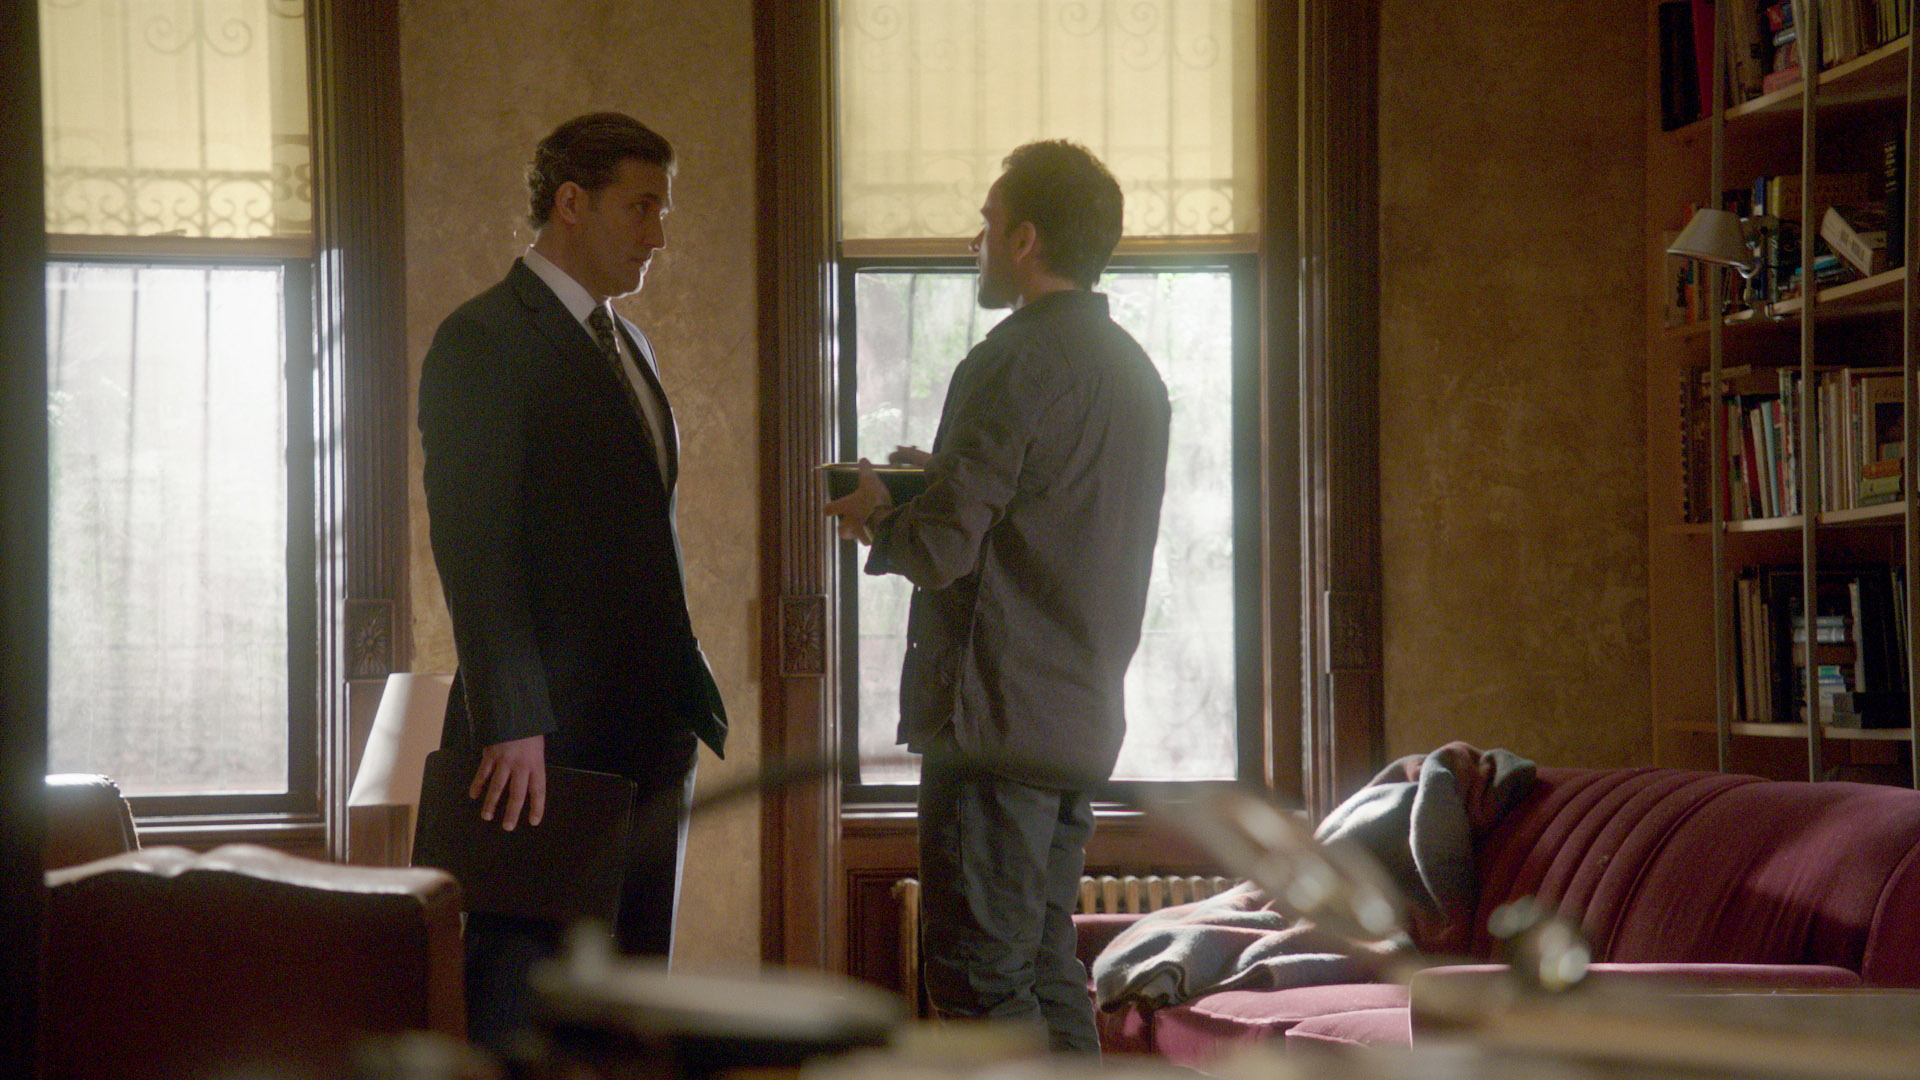 Jim and Sherlock